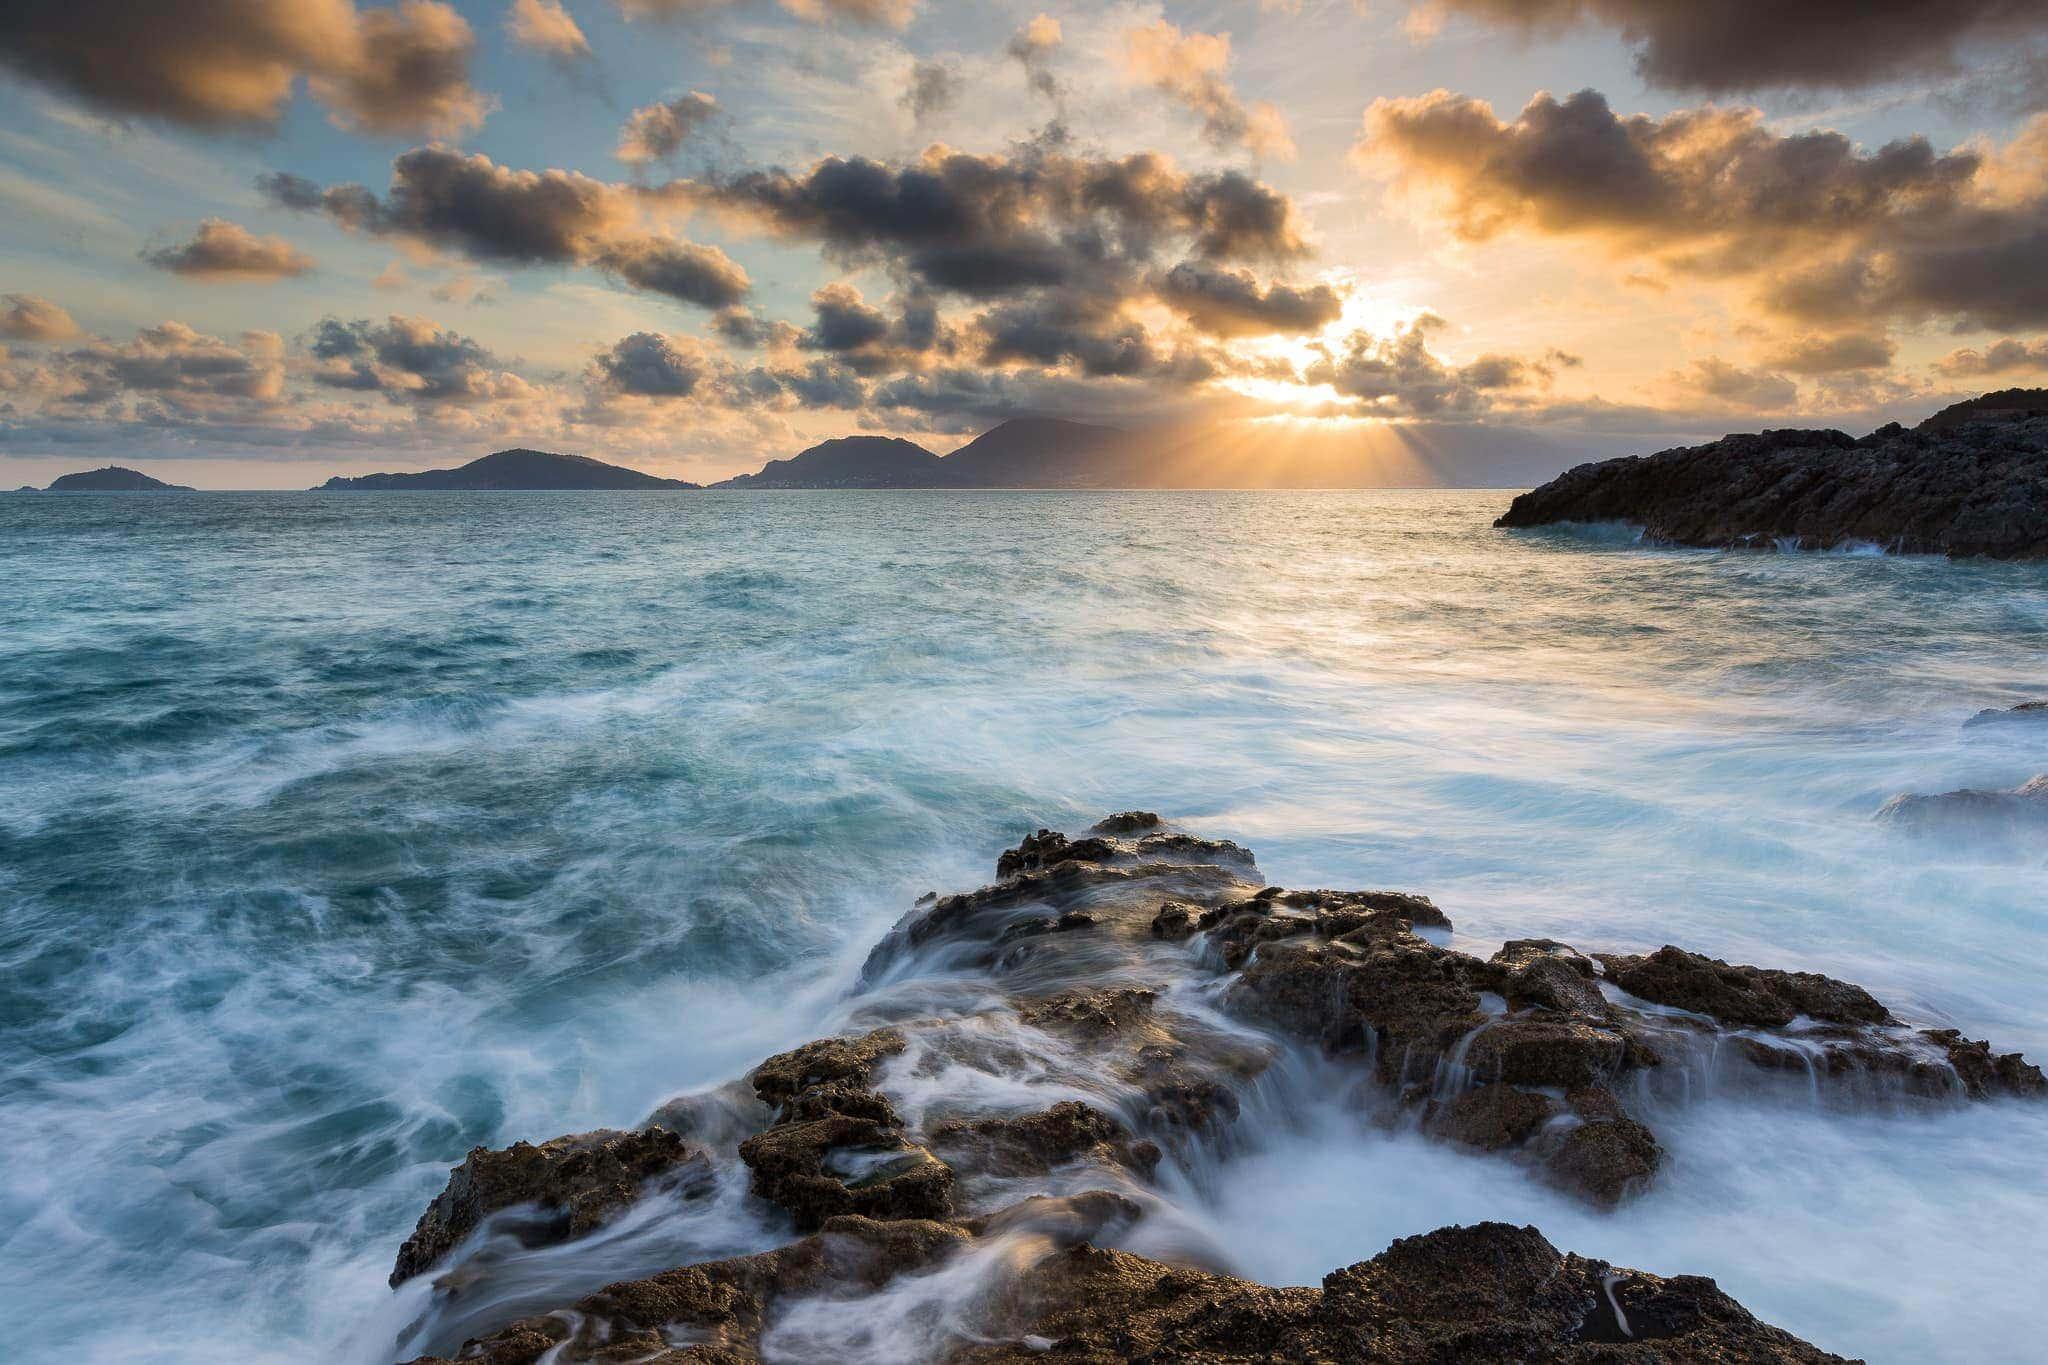 Francesco Gola Seascape Landscape Photography Long Exposure Sunset Summer Lerici Gulf Poets